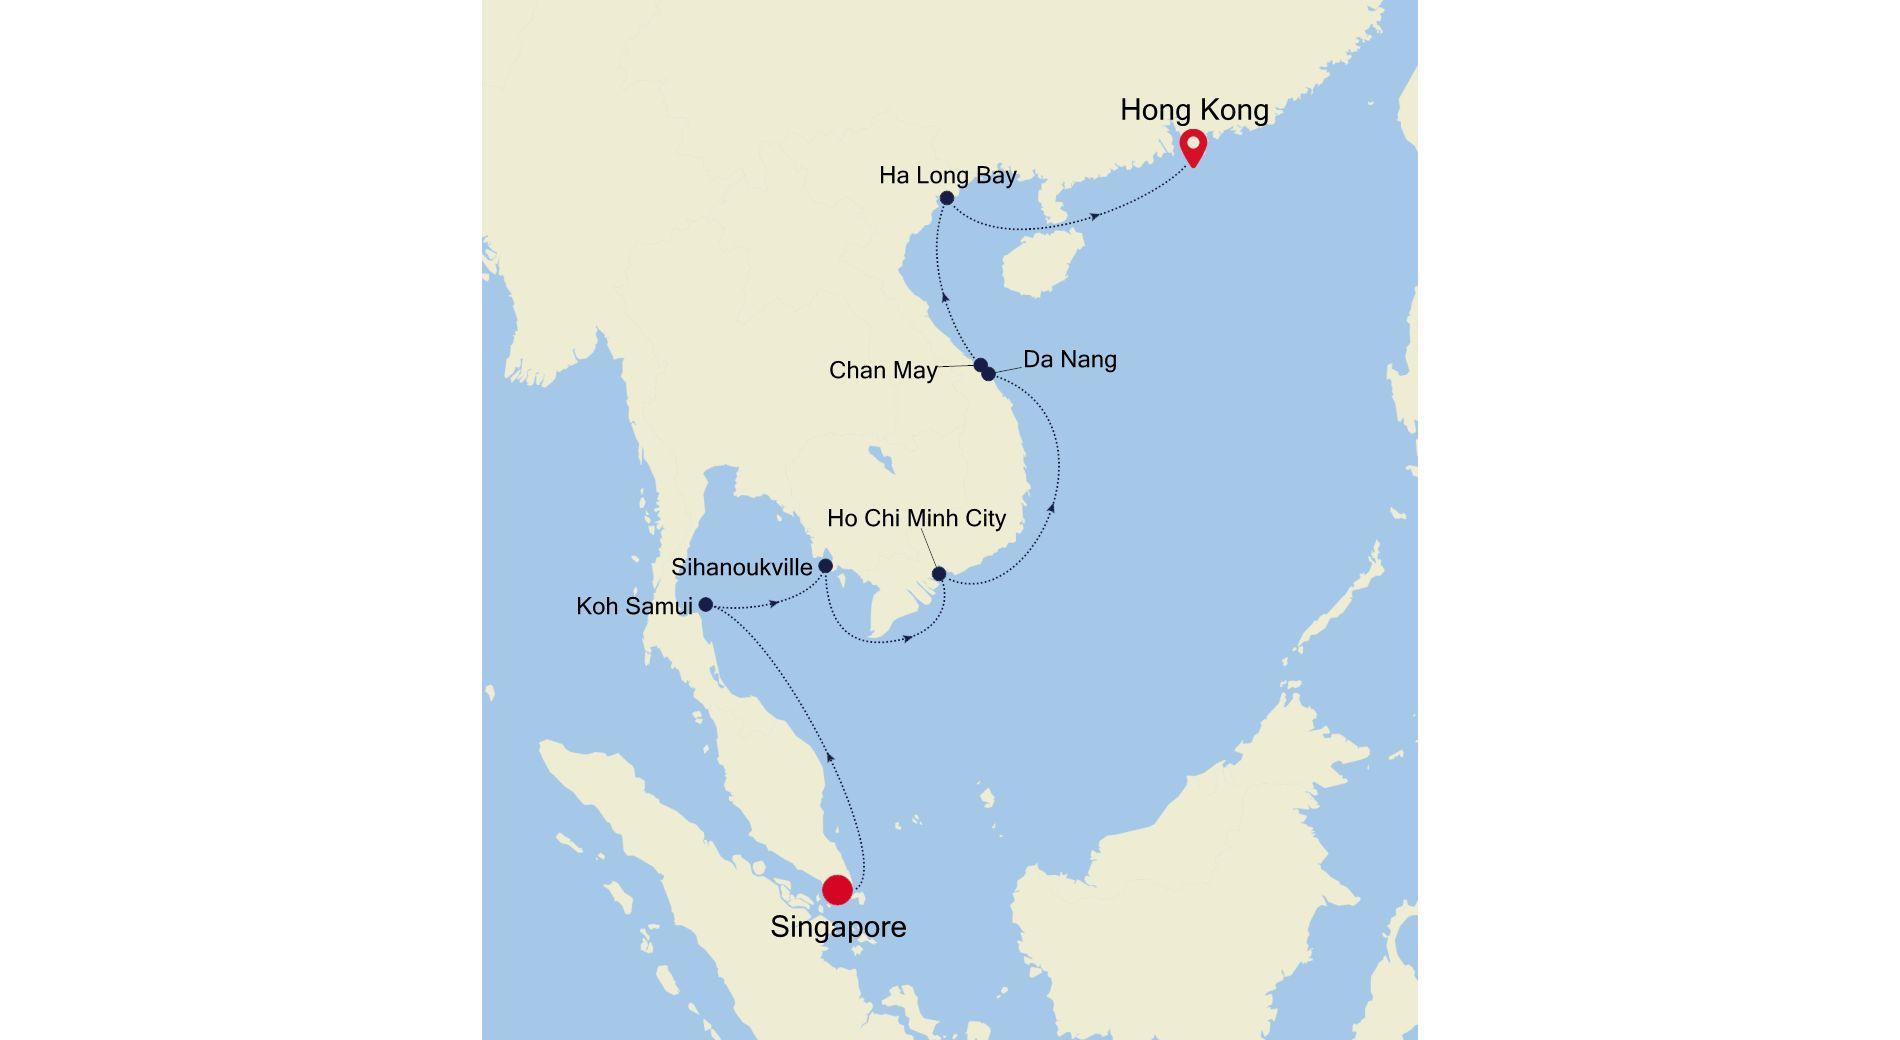 3905 - Singapore a Hong Kong